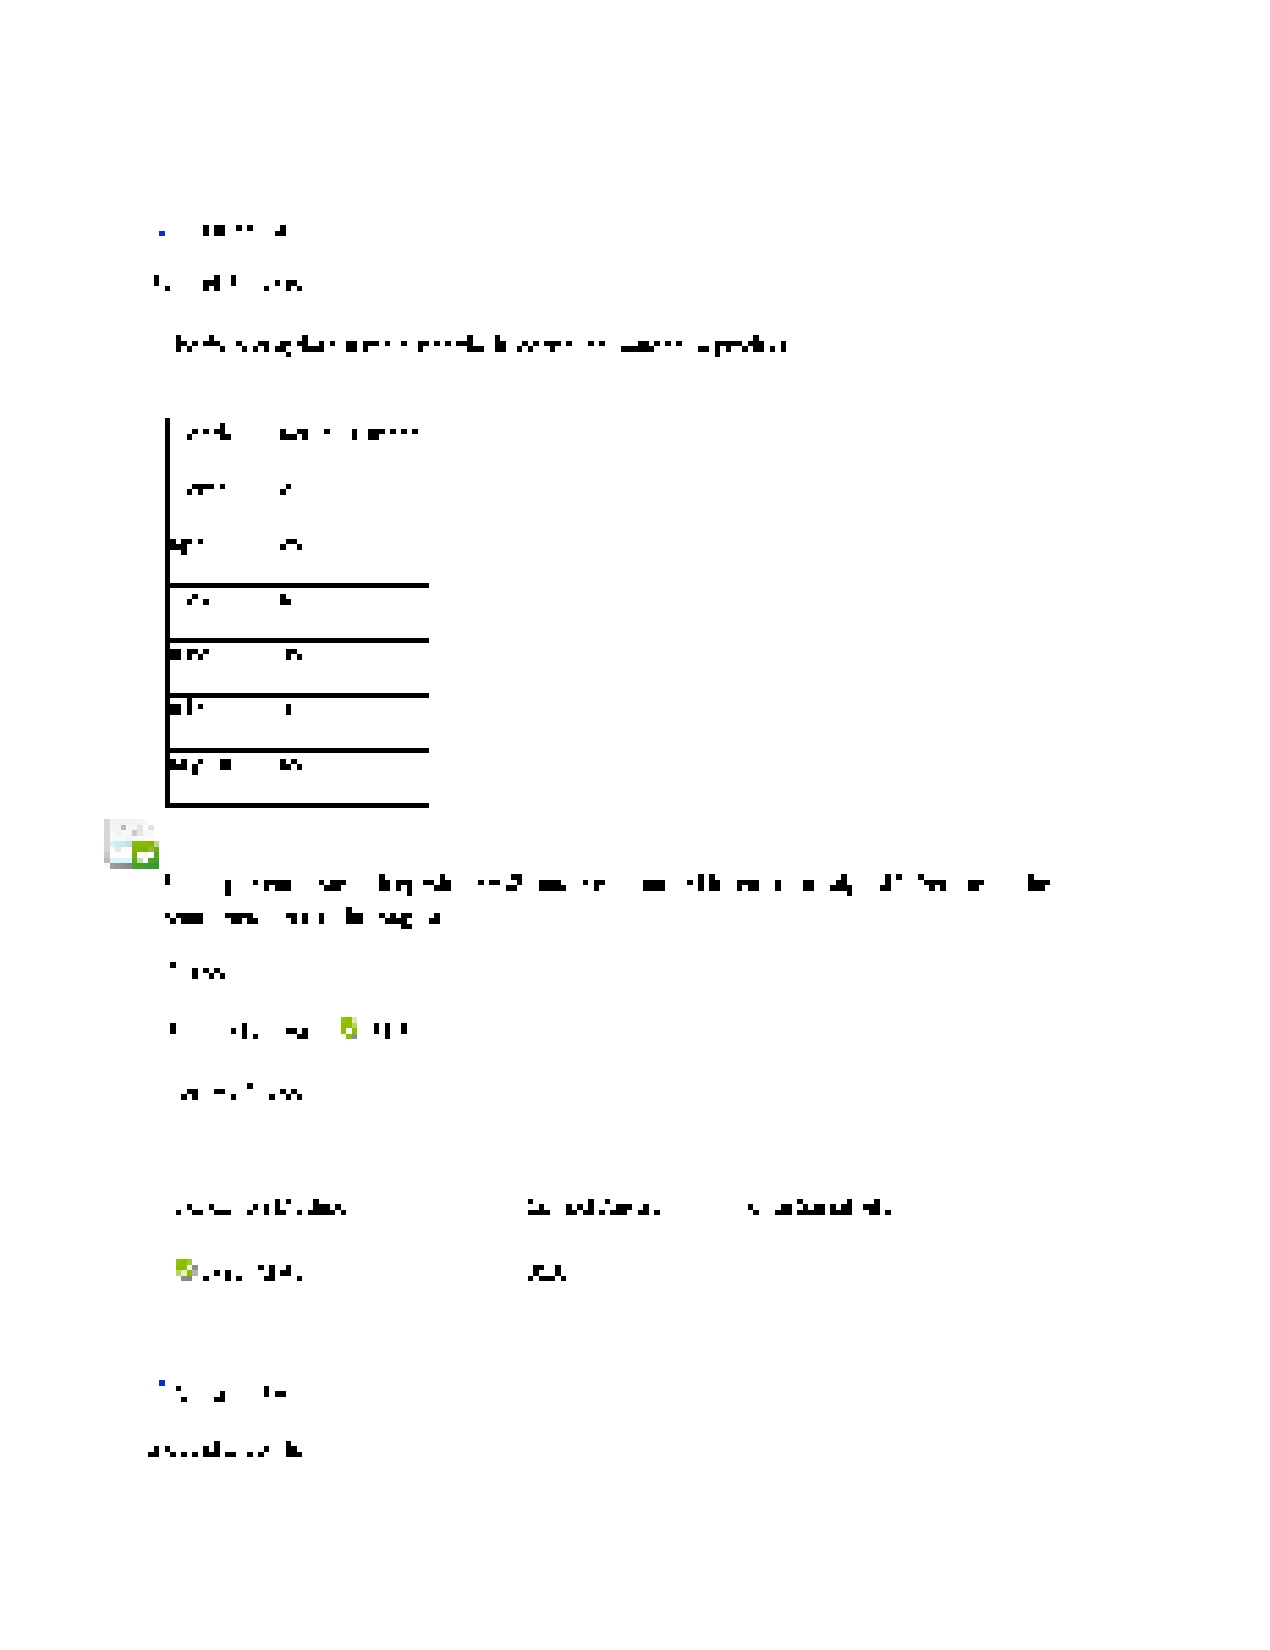 MAT 300 Statistics Aleks Midterm Exam Answers